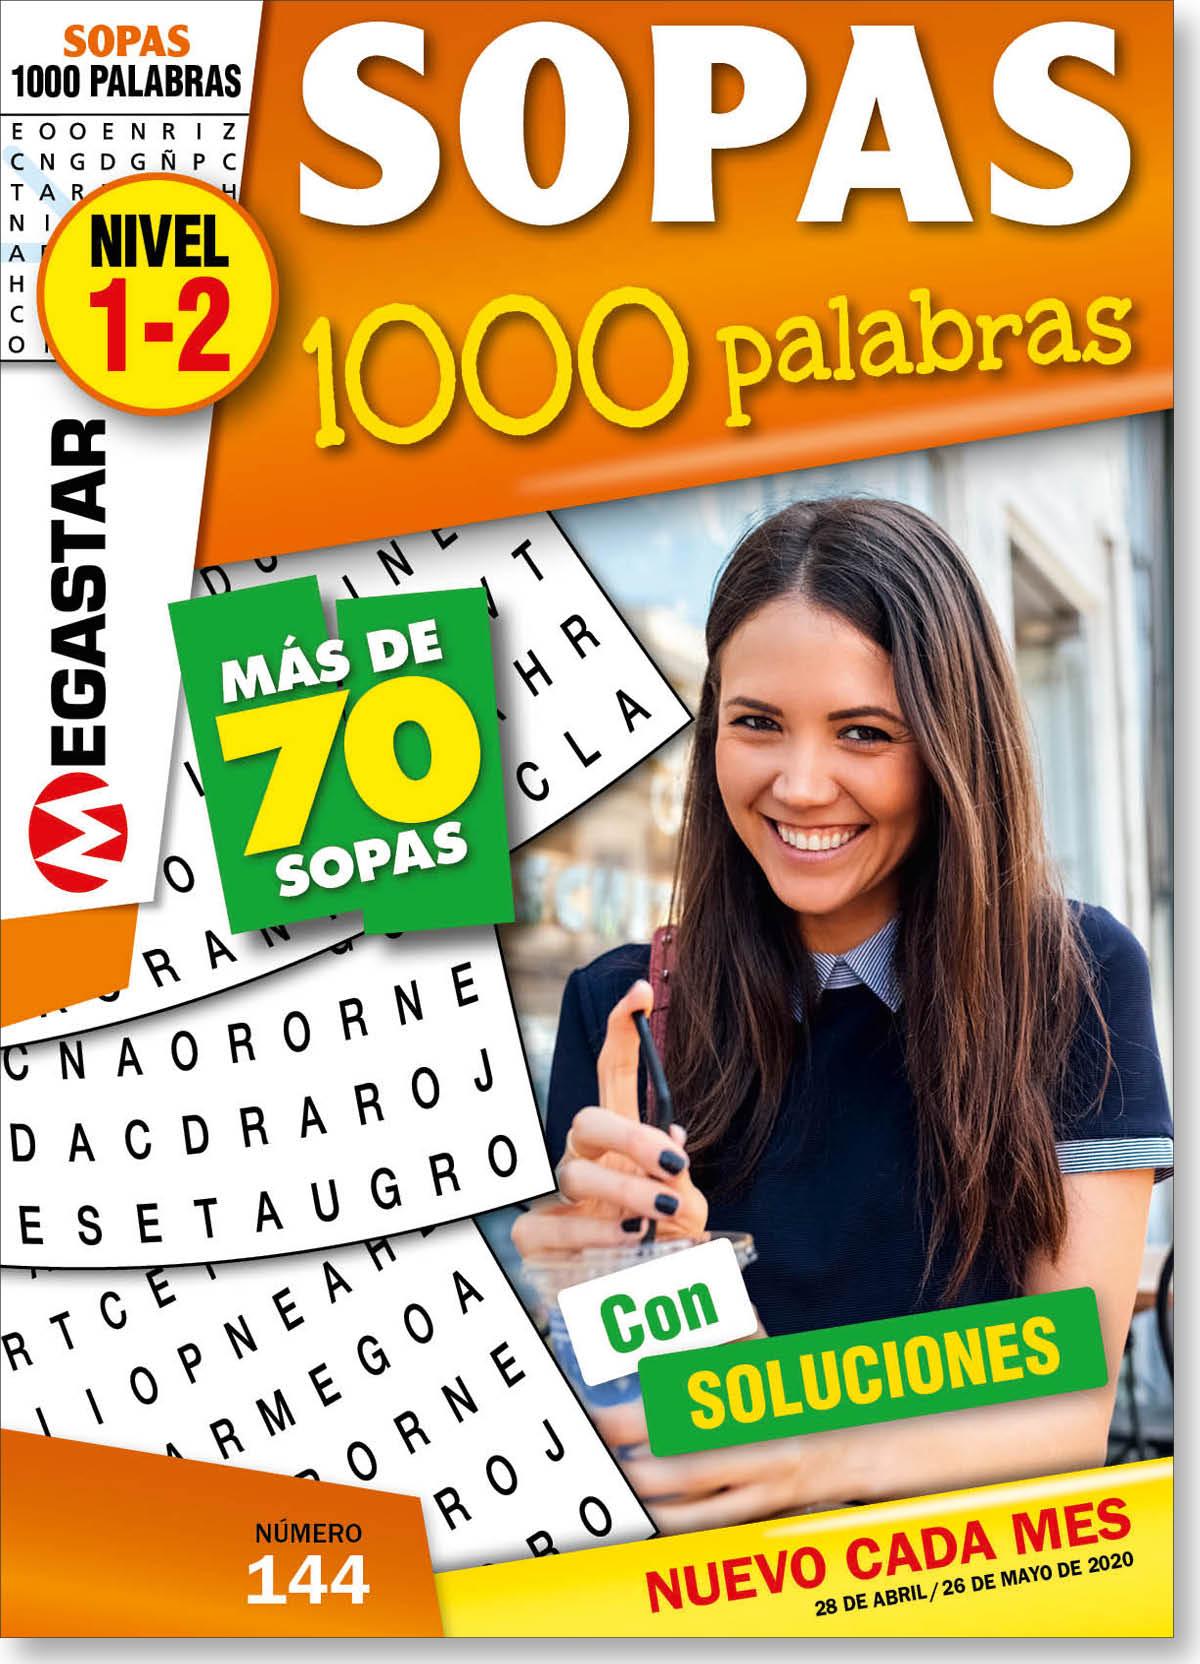 Sopas 1000 Palabras 1-2